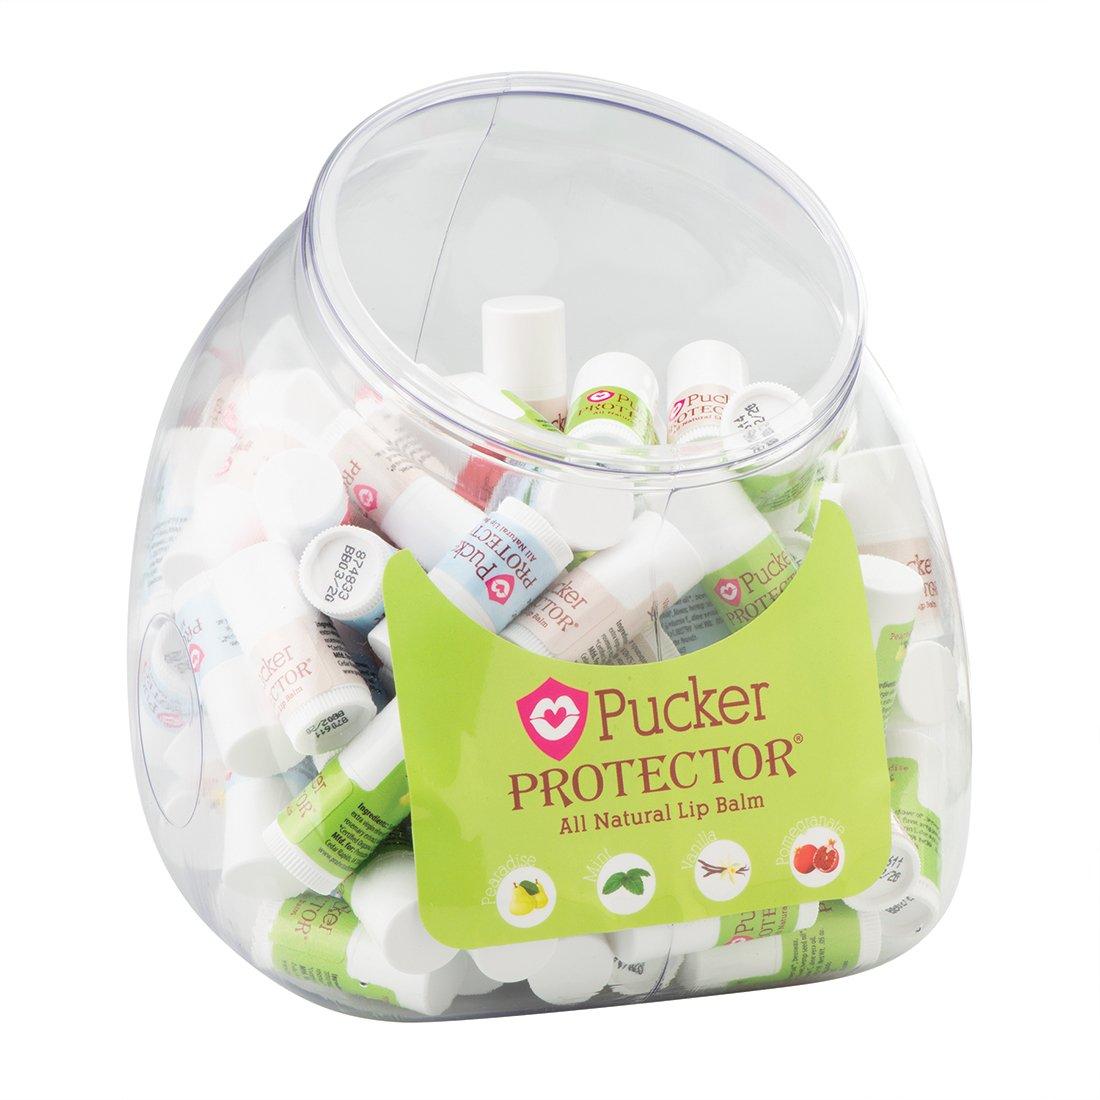 Pucker Protector Naturals Lip Balm - Lip Care Products - 120 per Pack